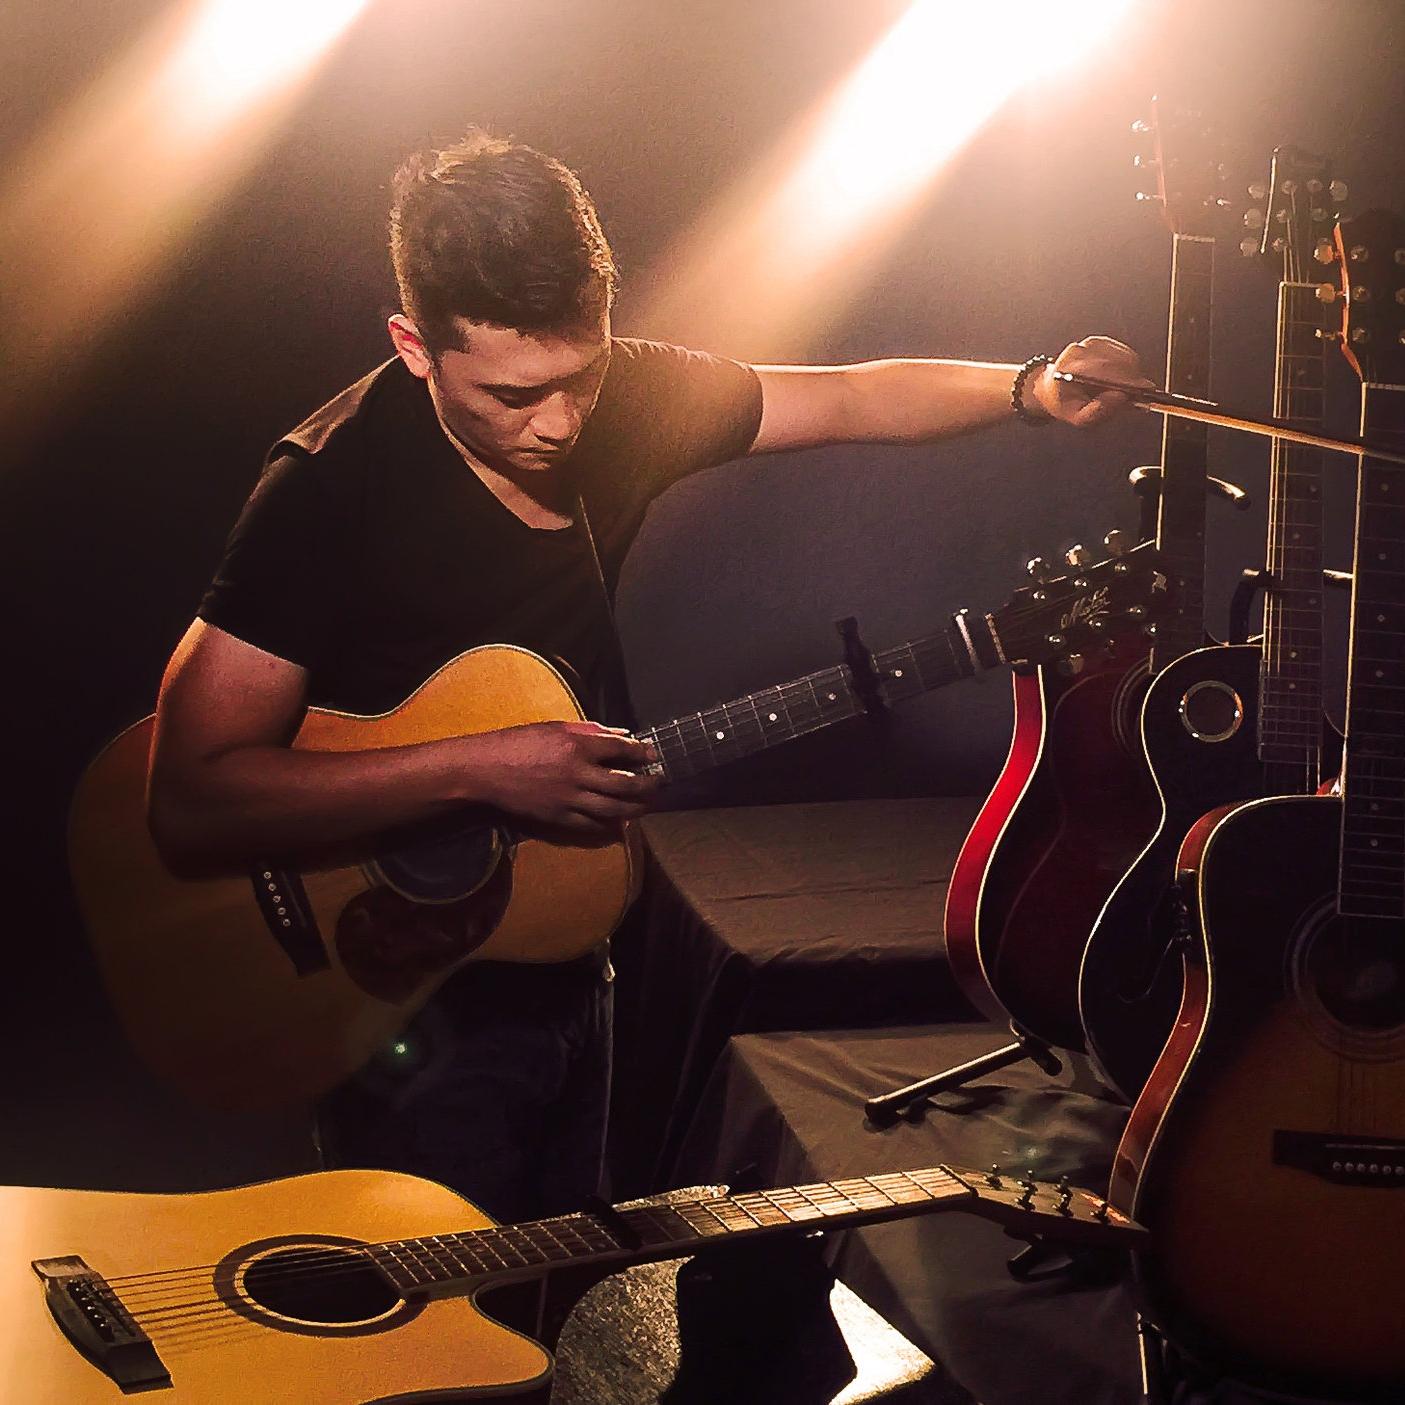 <p><a href=/artists/lj-manzano>LJ Manzano</a>Guitarist, Composer, Singer / Songwriter, Producer</p>